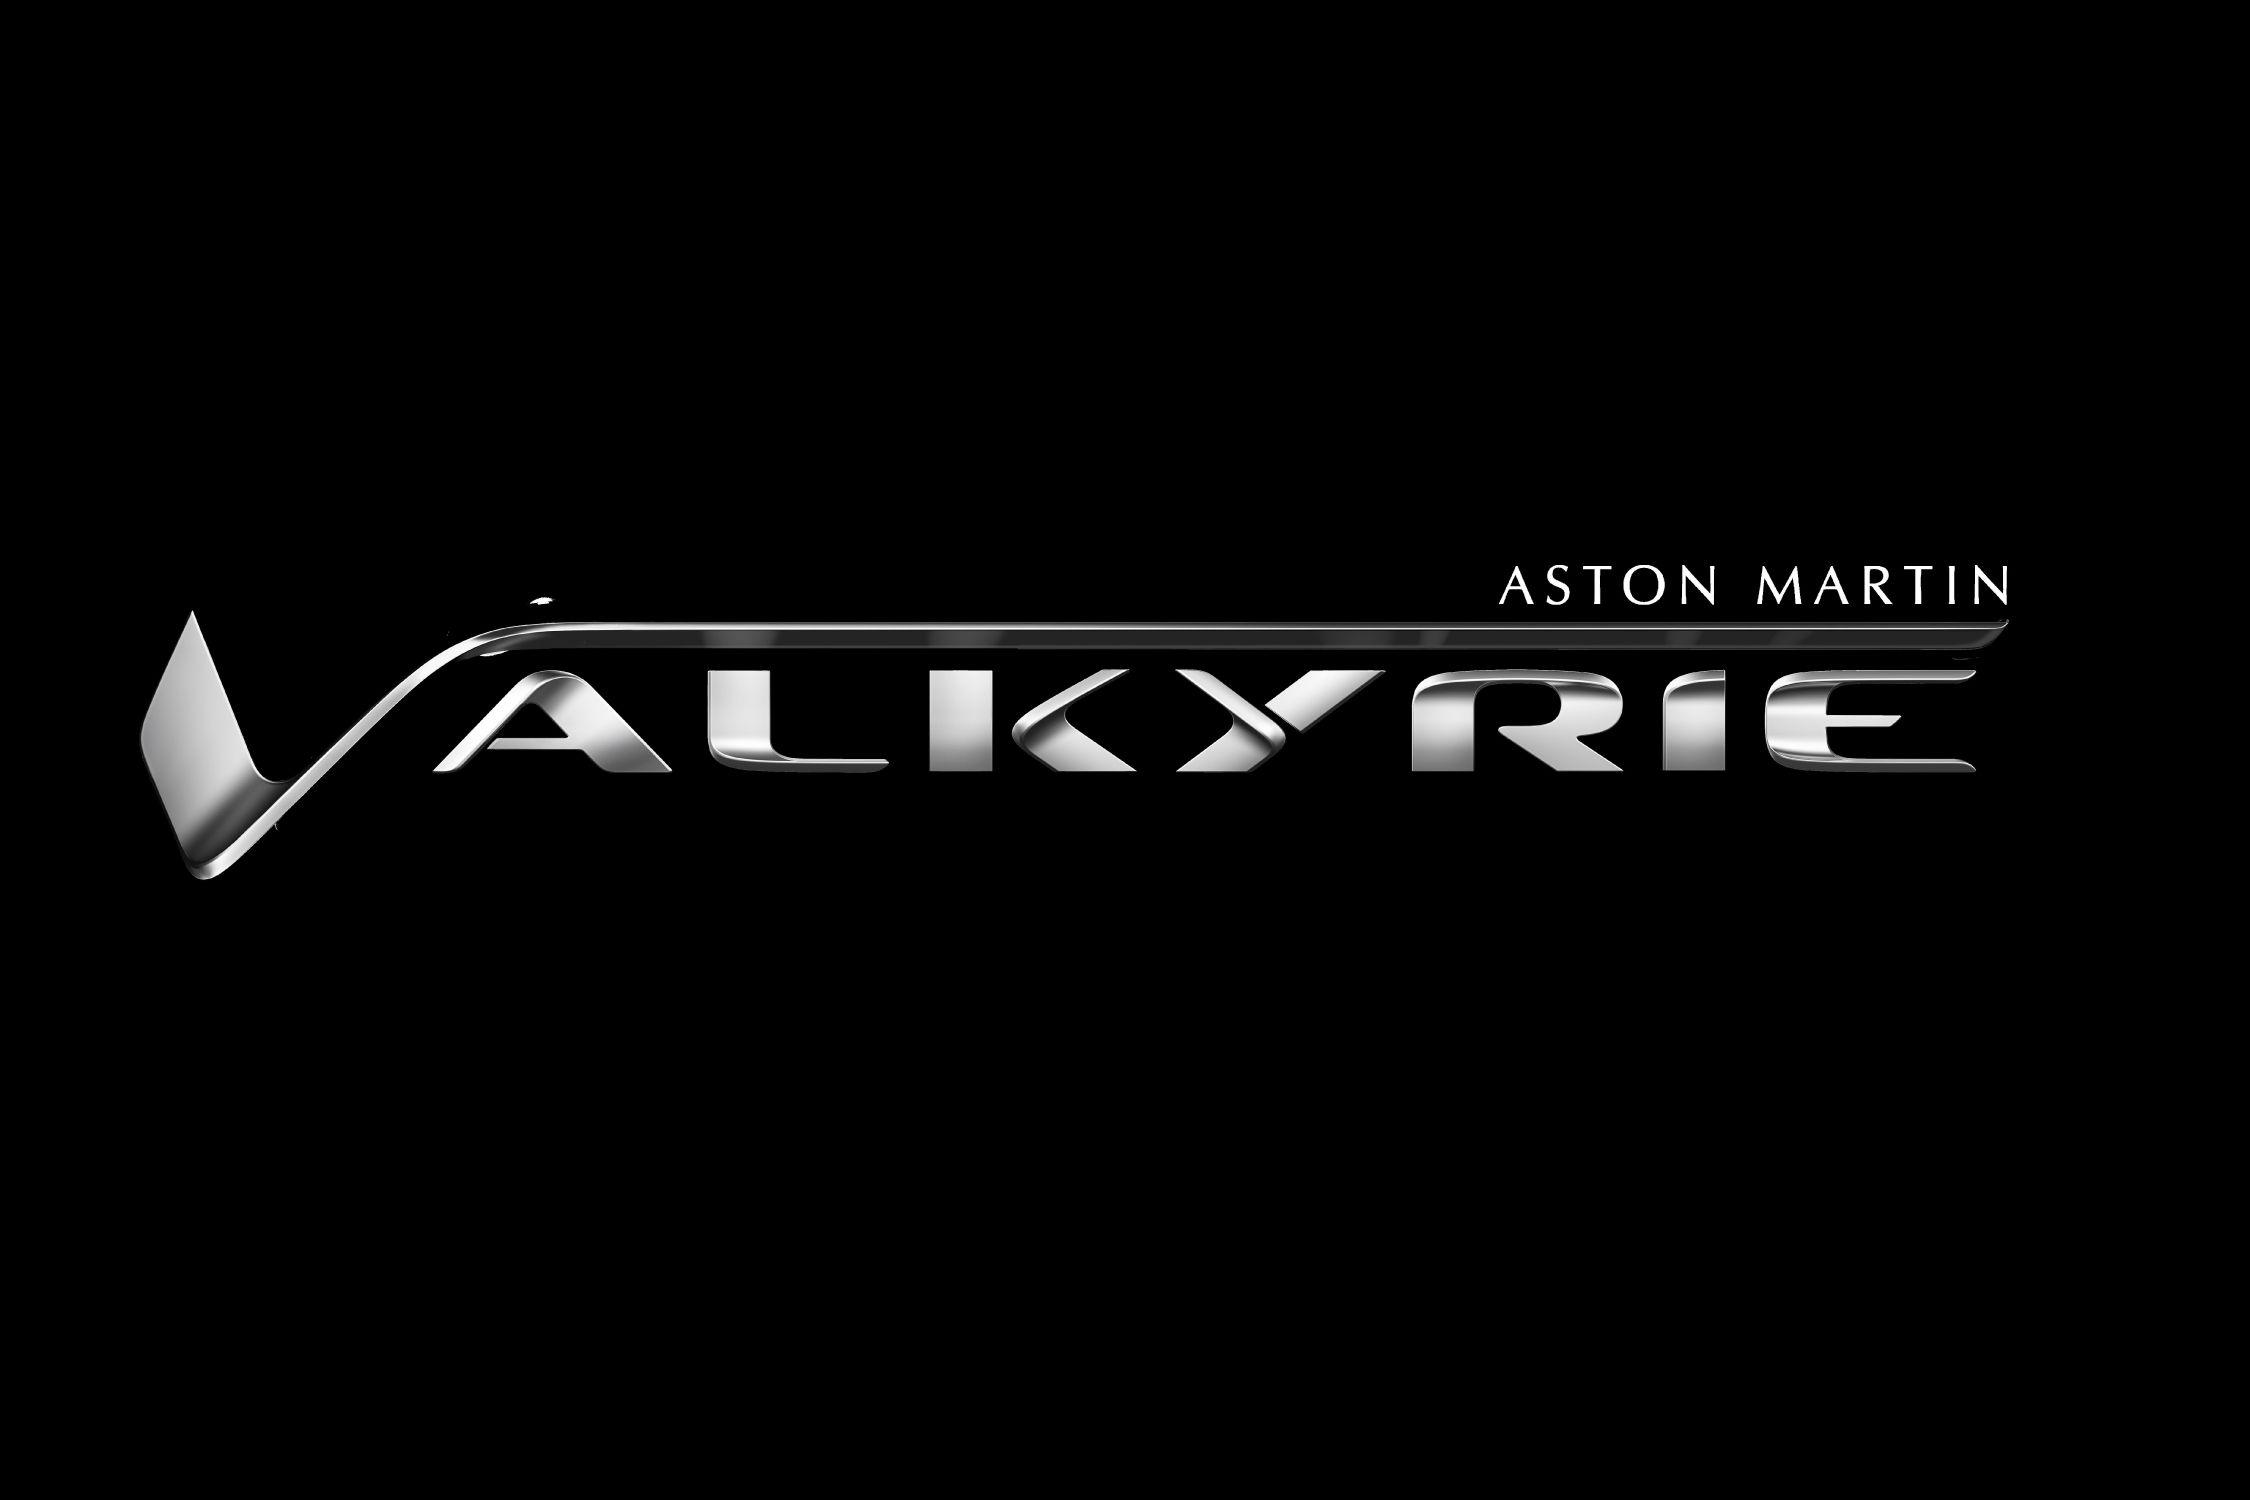 Aston Martin Valkyrie : l'hypercar AM-RB 001 à un nom !